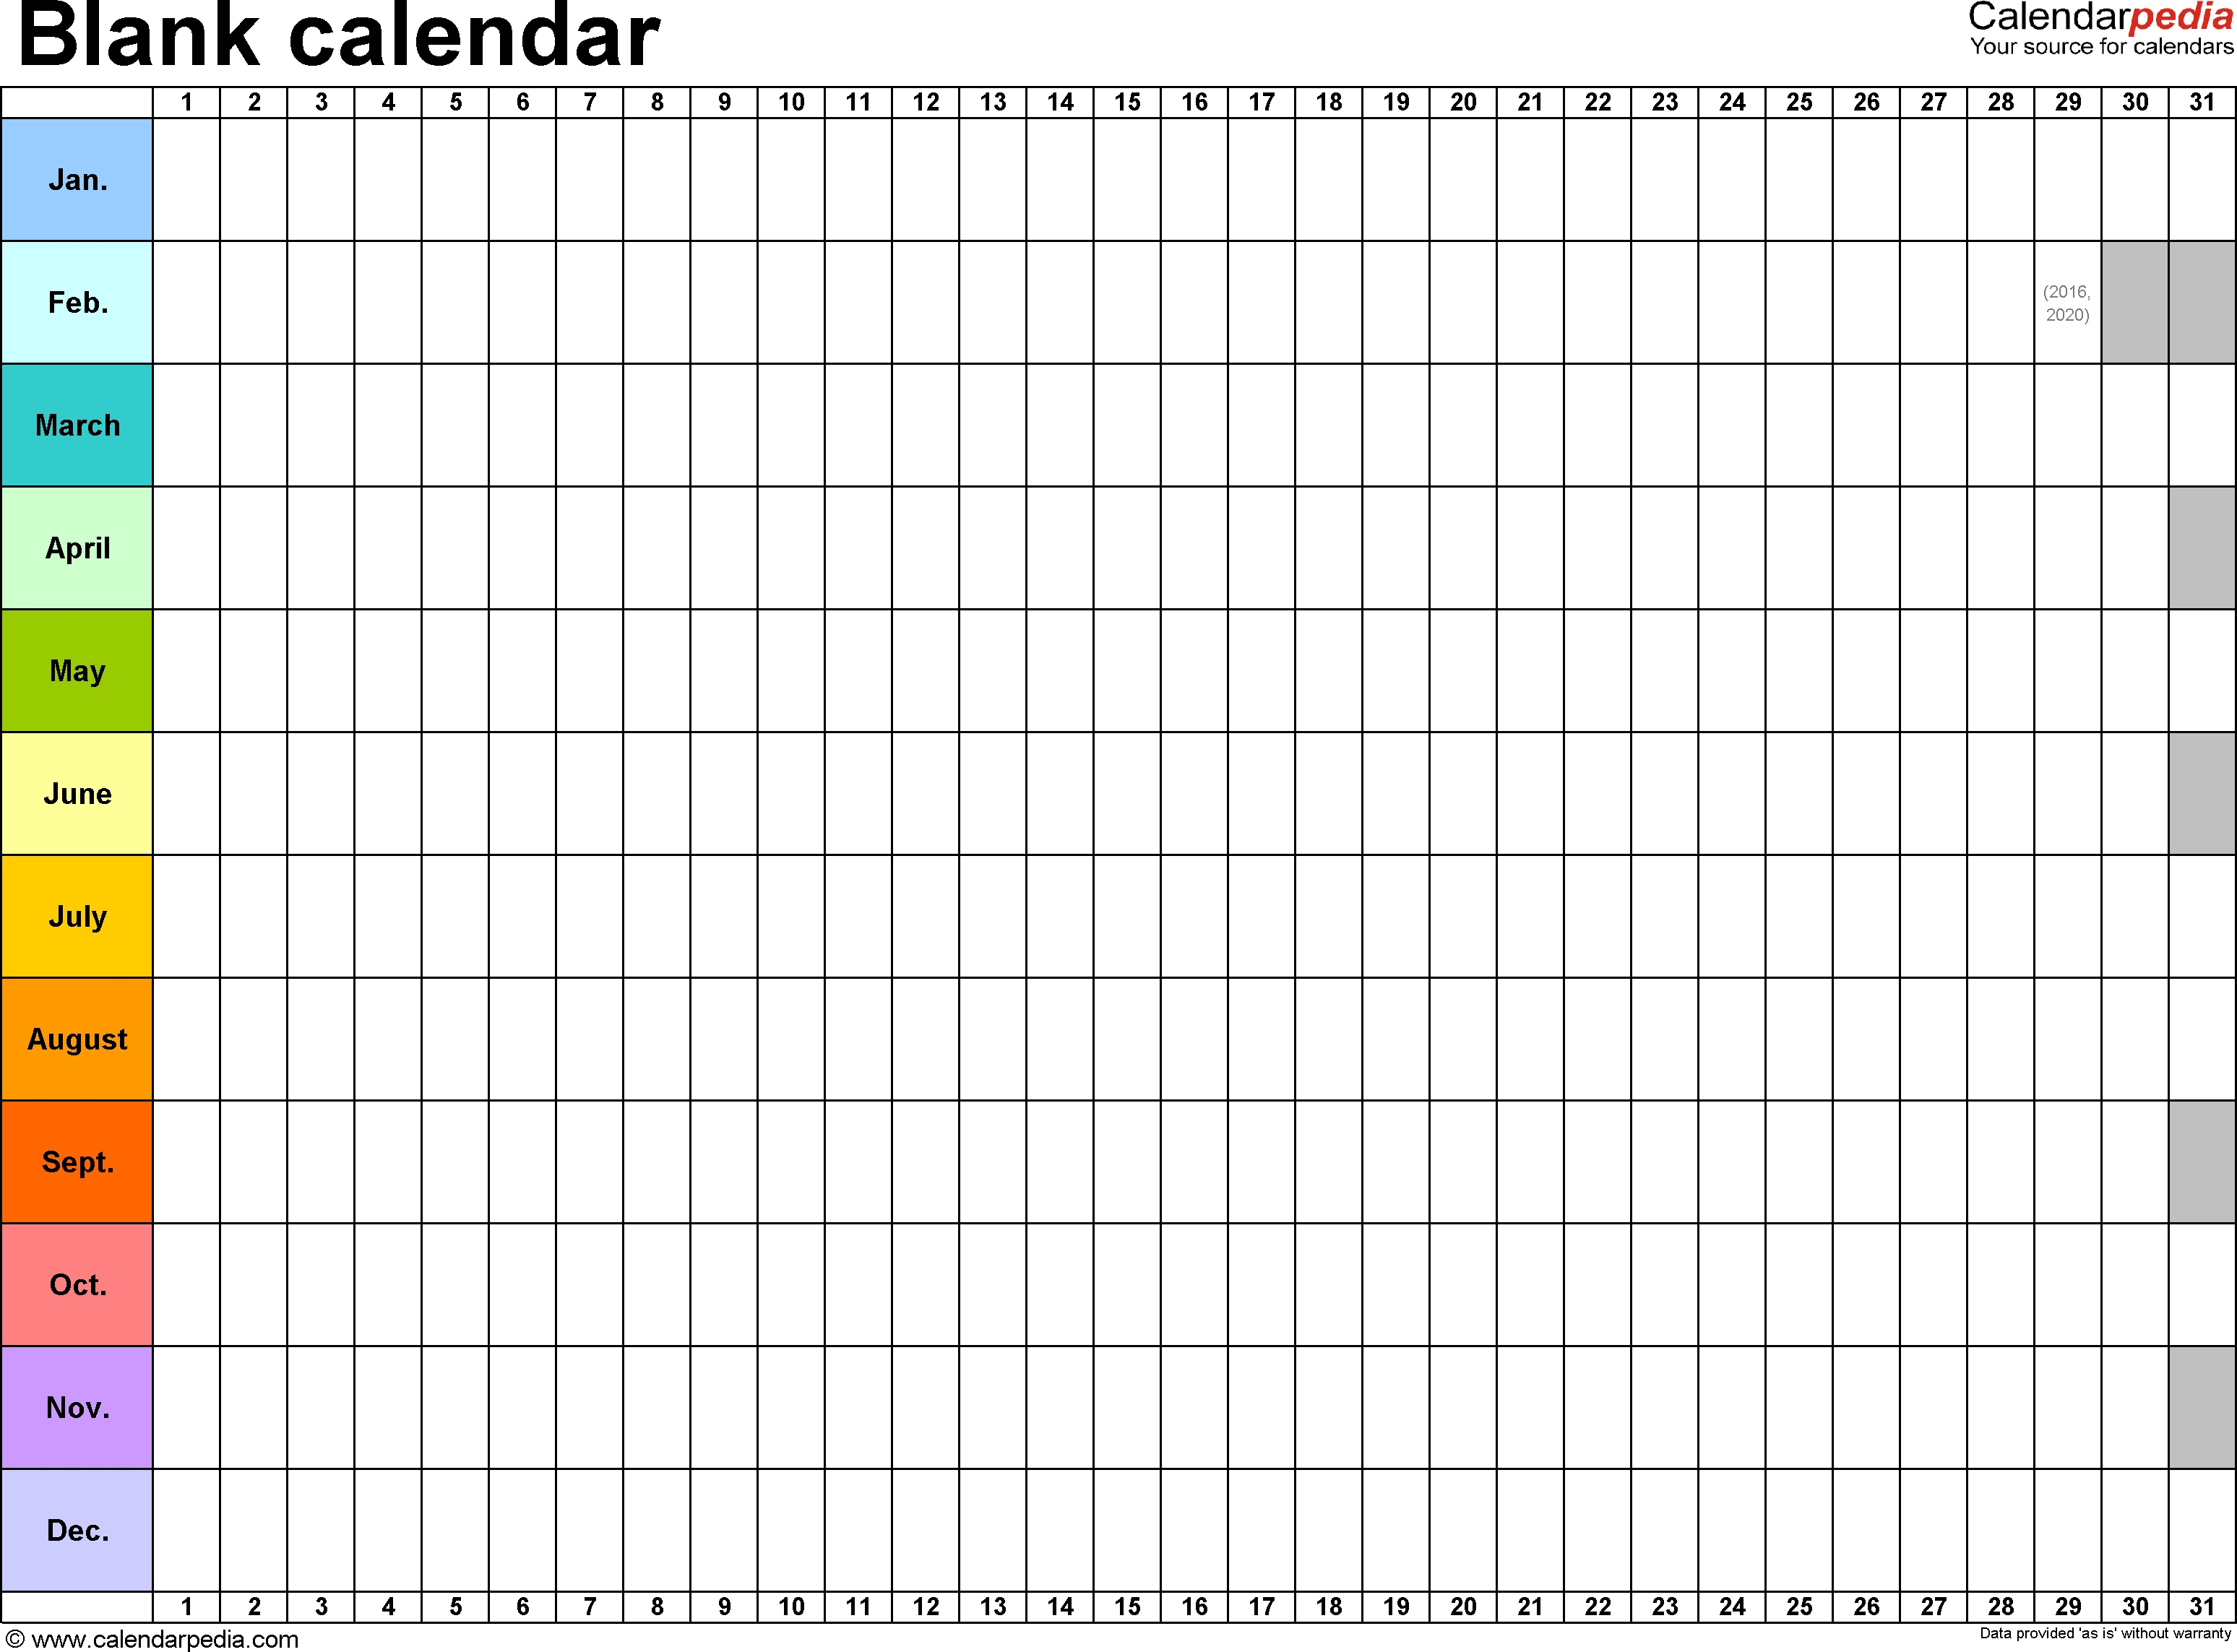 Blank Calendar - 9 Free Printable Microsoft Word Templates with regard to Free Printable Blank Calendar Month 1